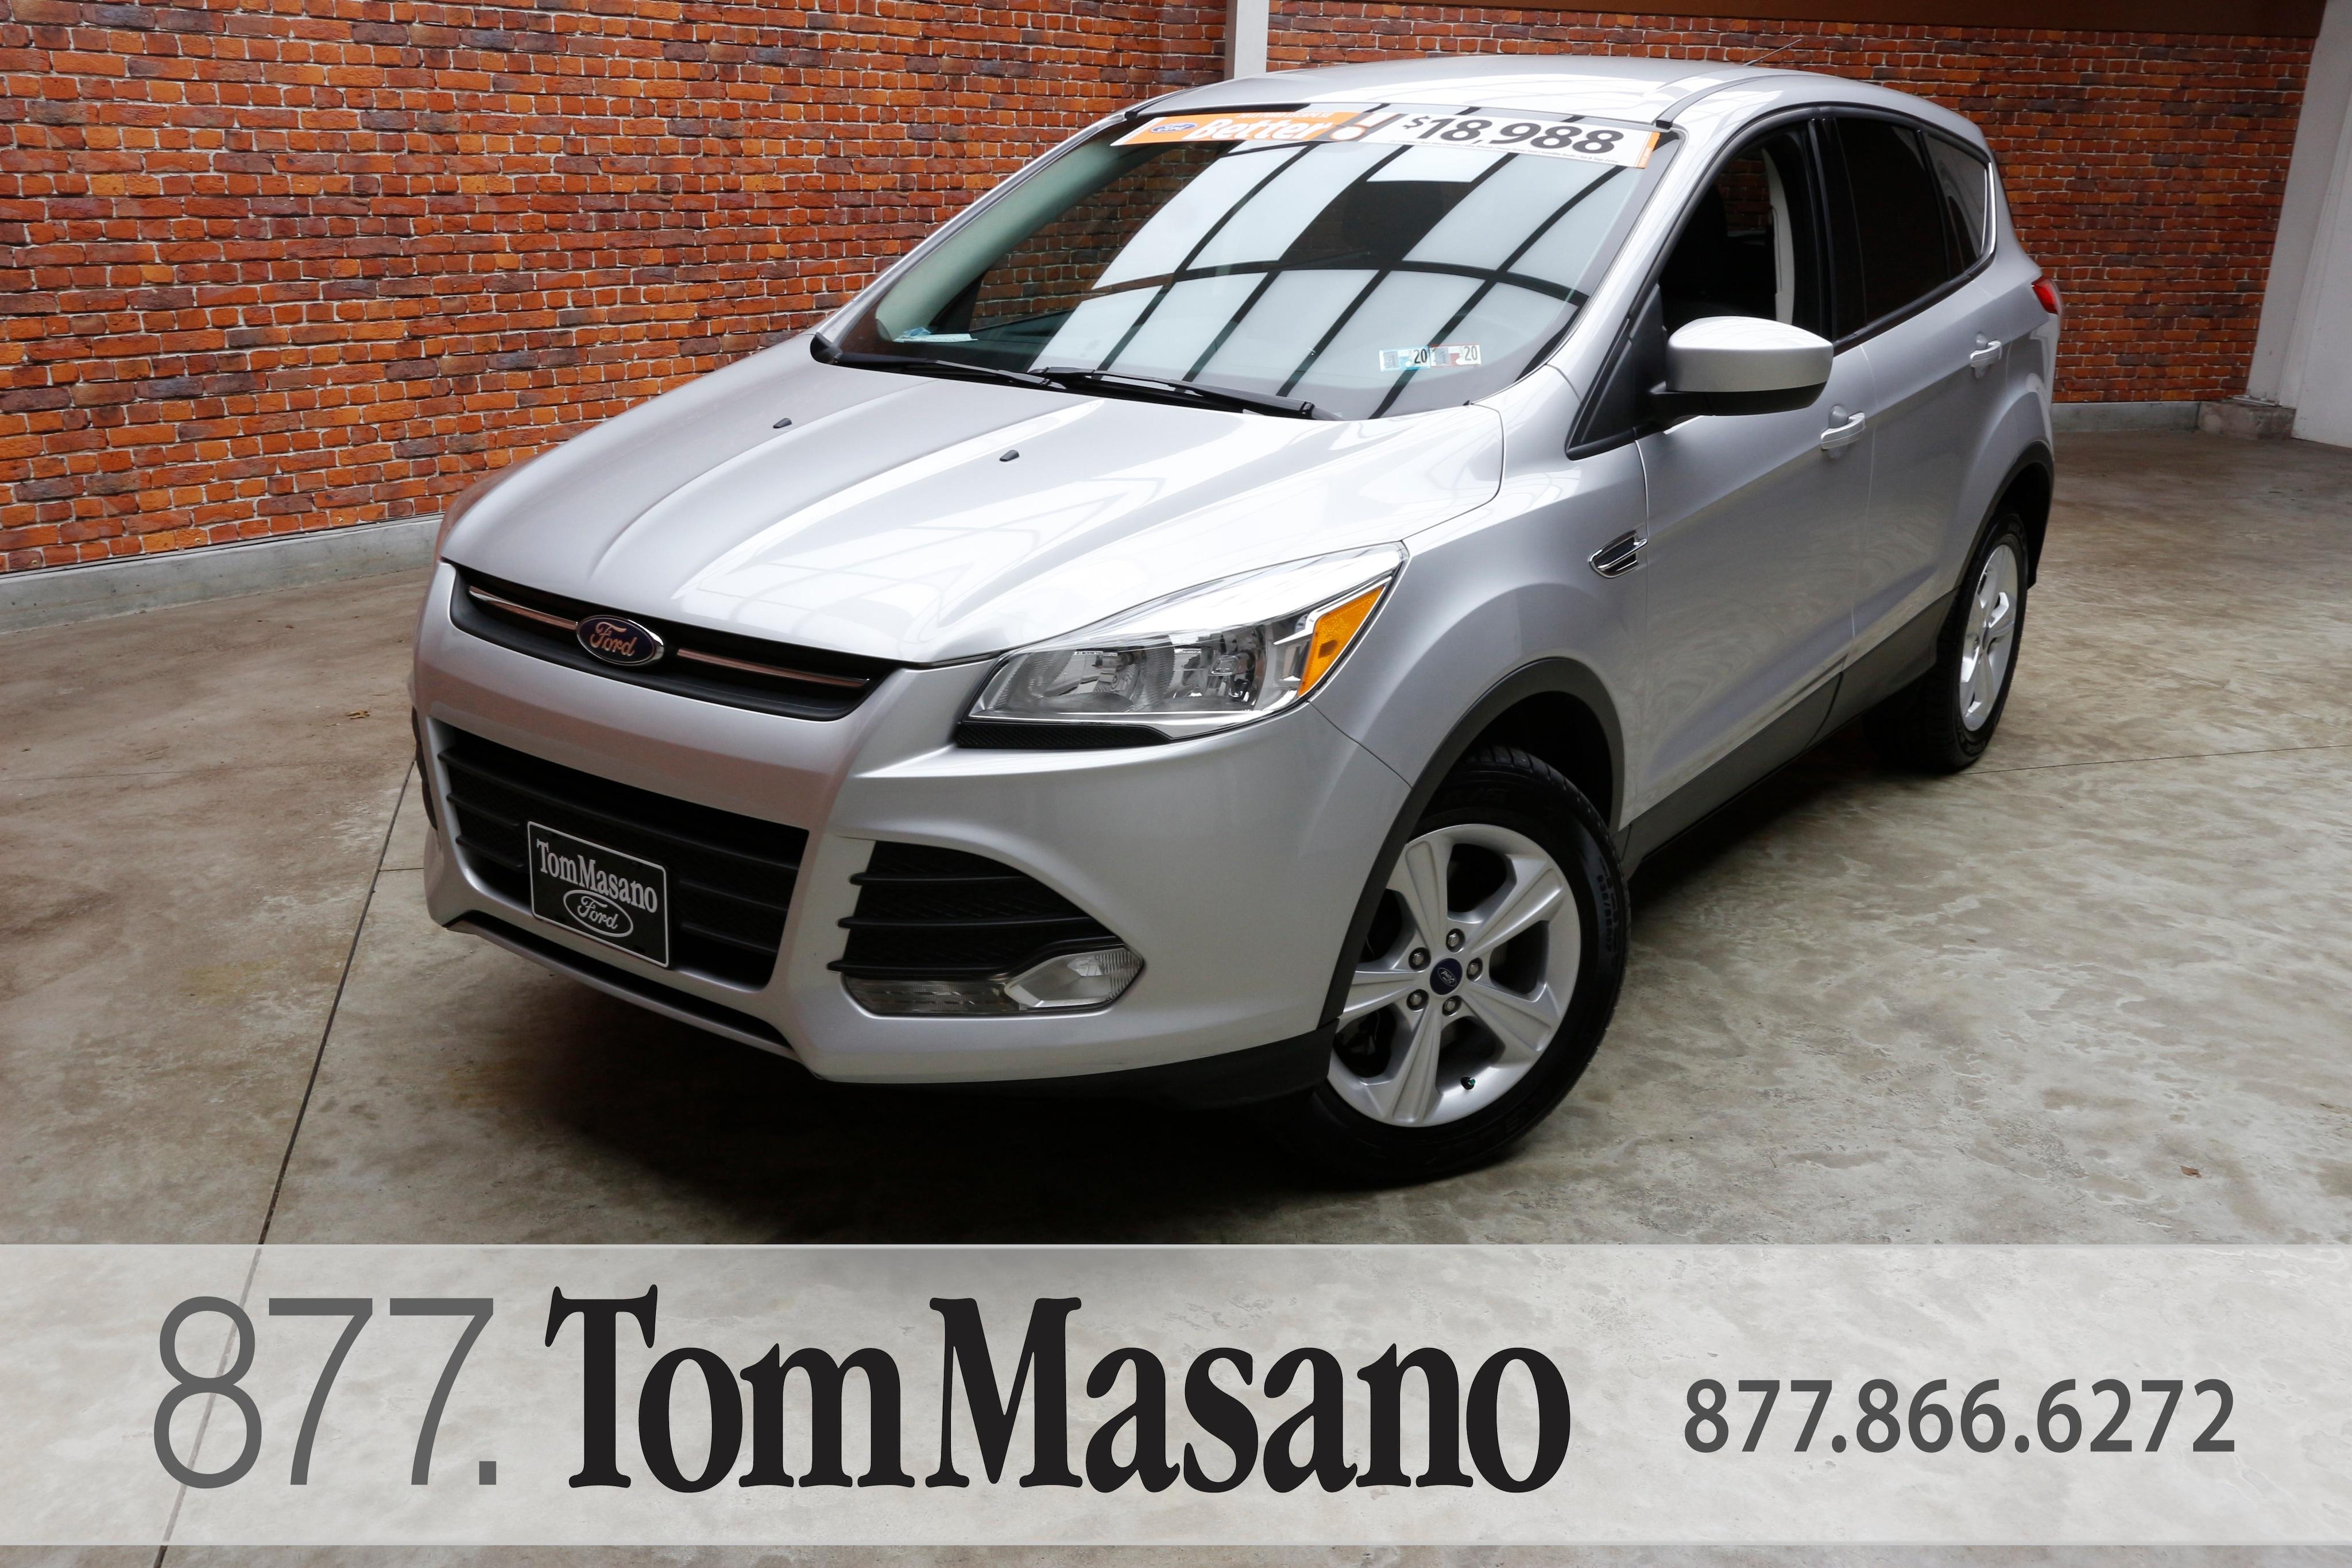 Tom Masano Used Cars >> Used 2015 Ford Escape For Sale At Tom Masano Lincoln Vin